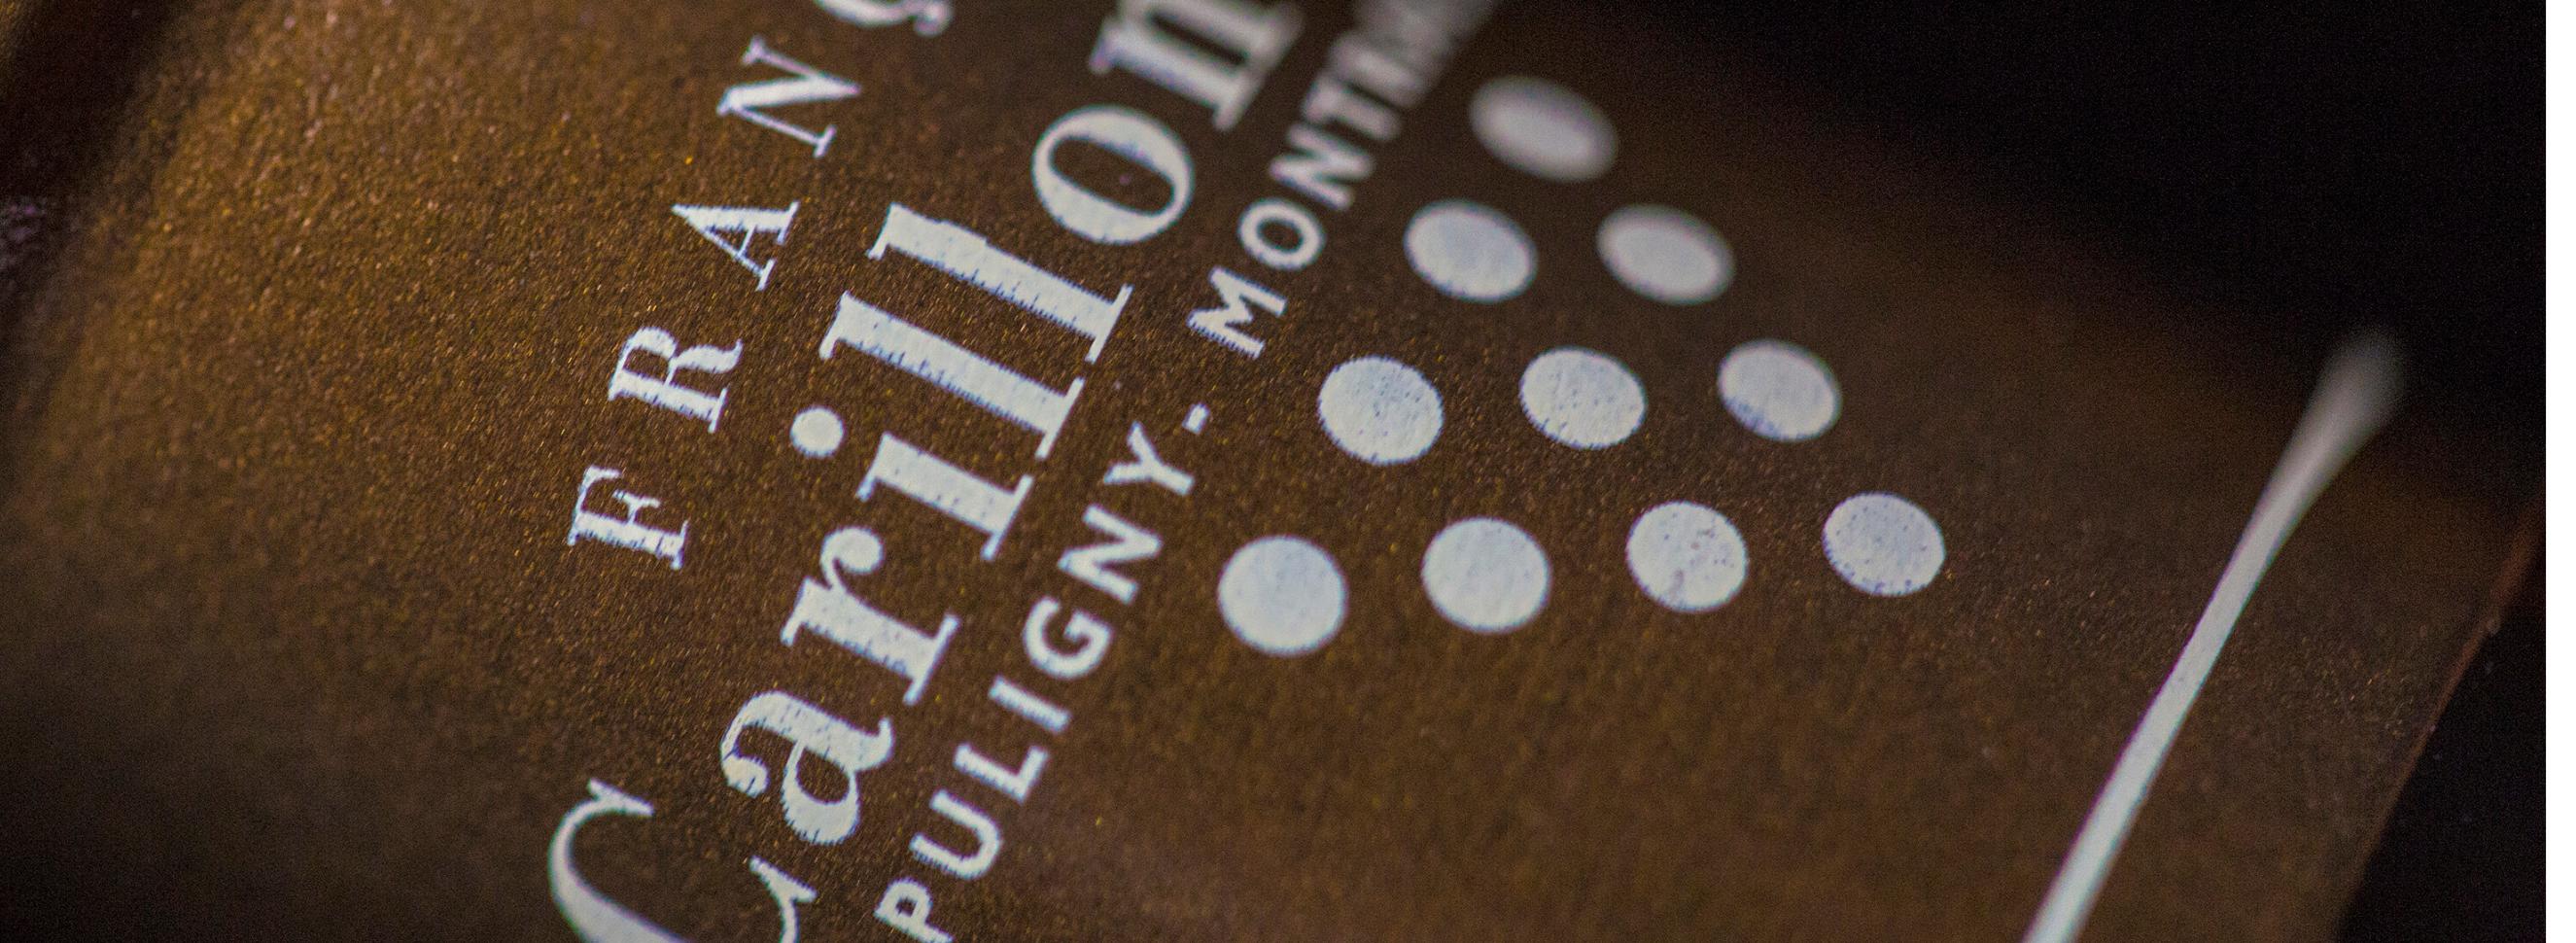 Domaine Francois Carillon Tasting at Otto's